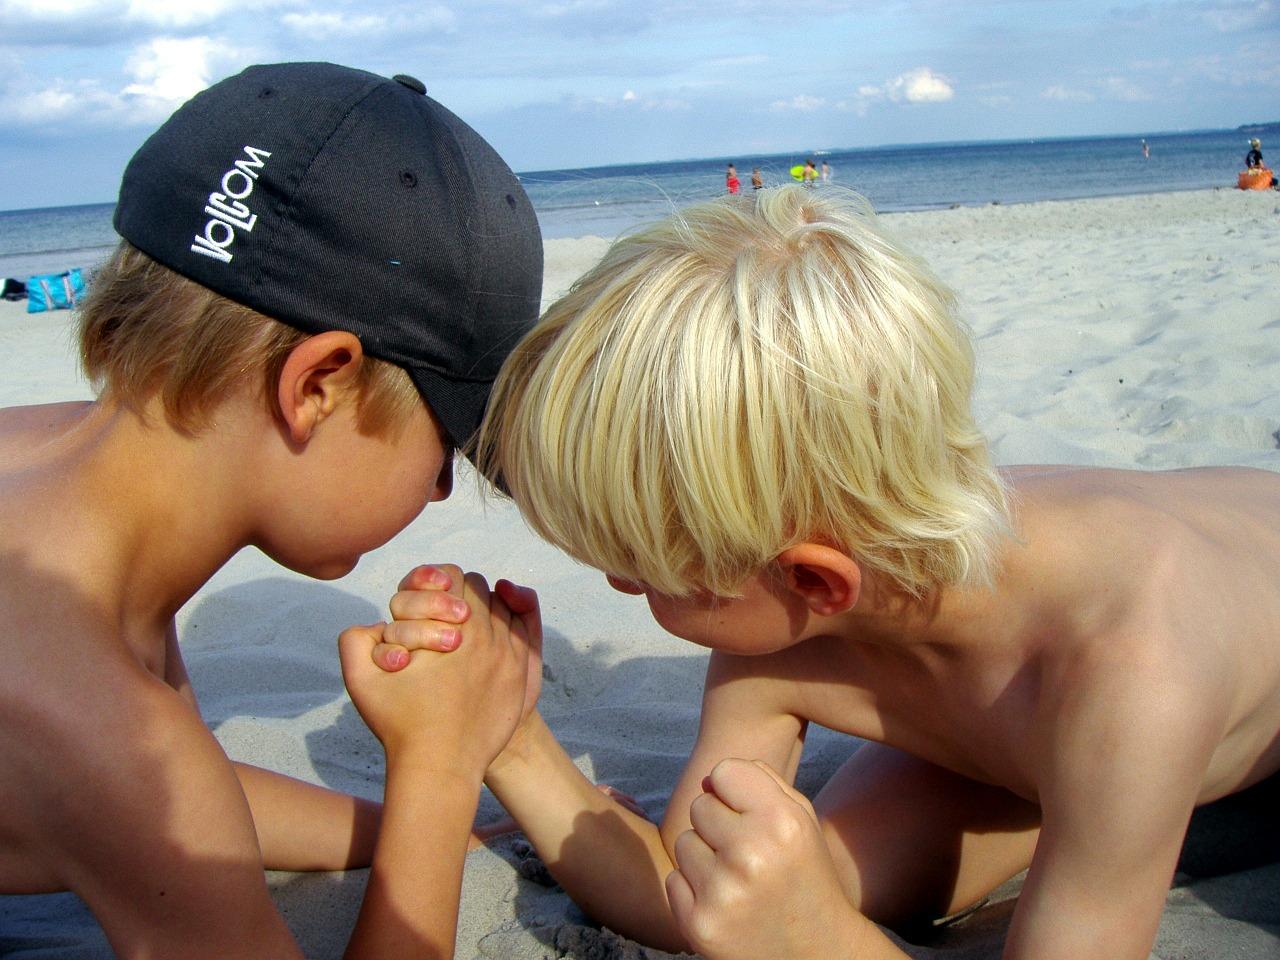 arm-wrestling-176645_1280